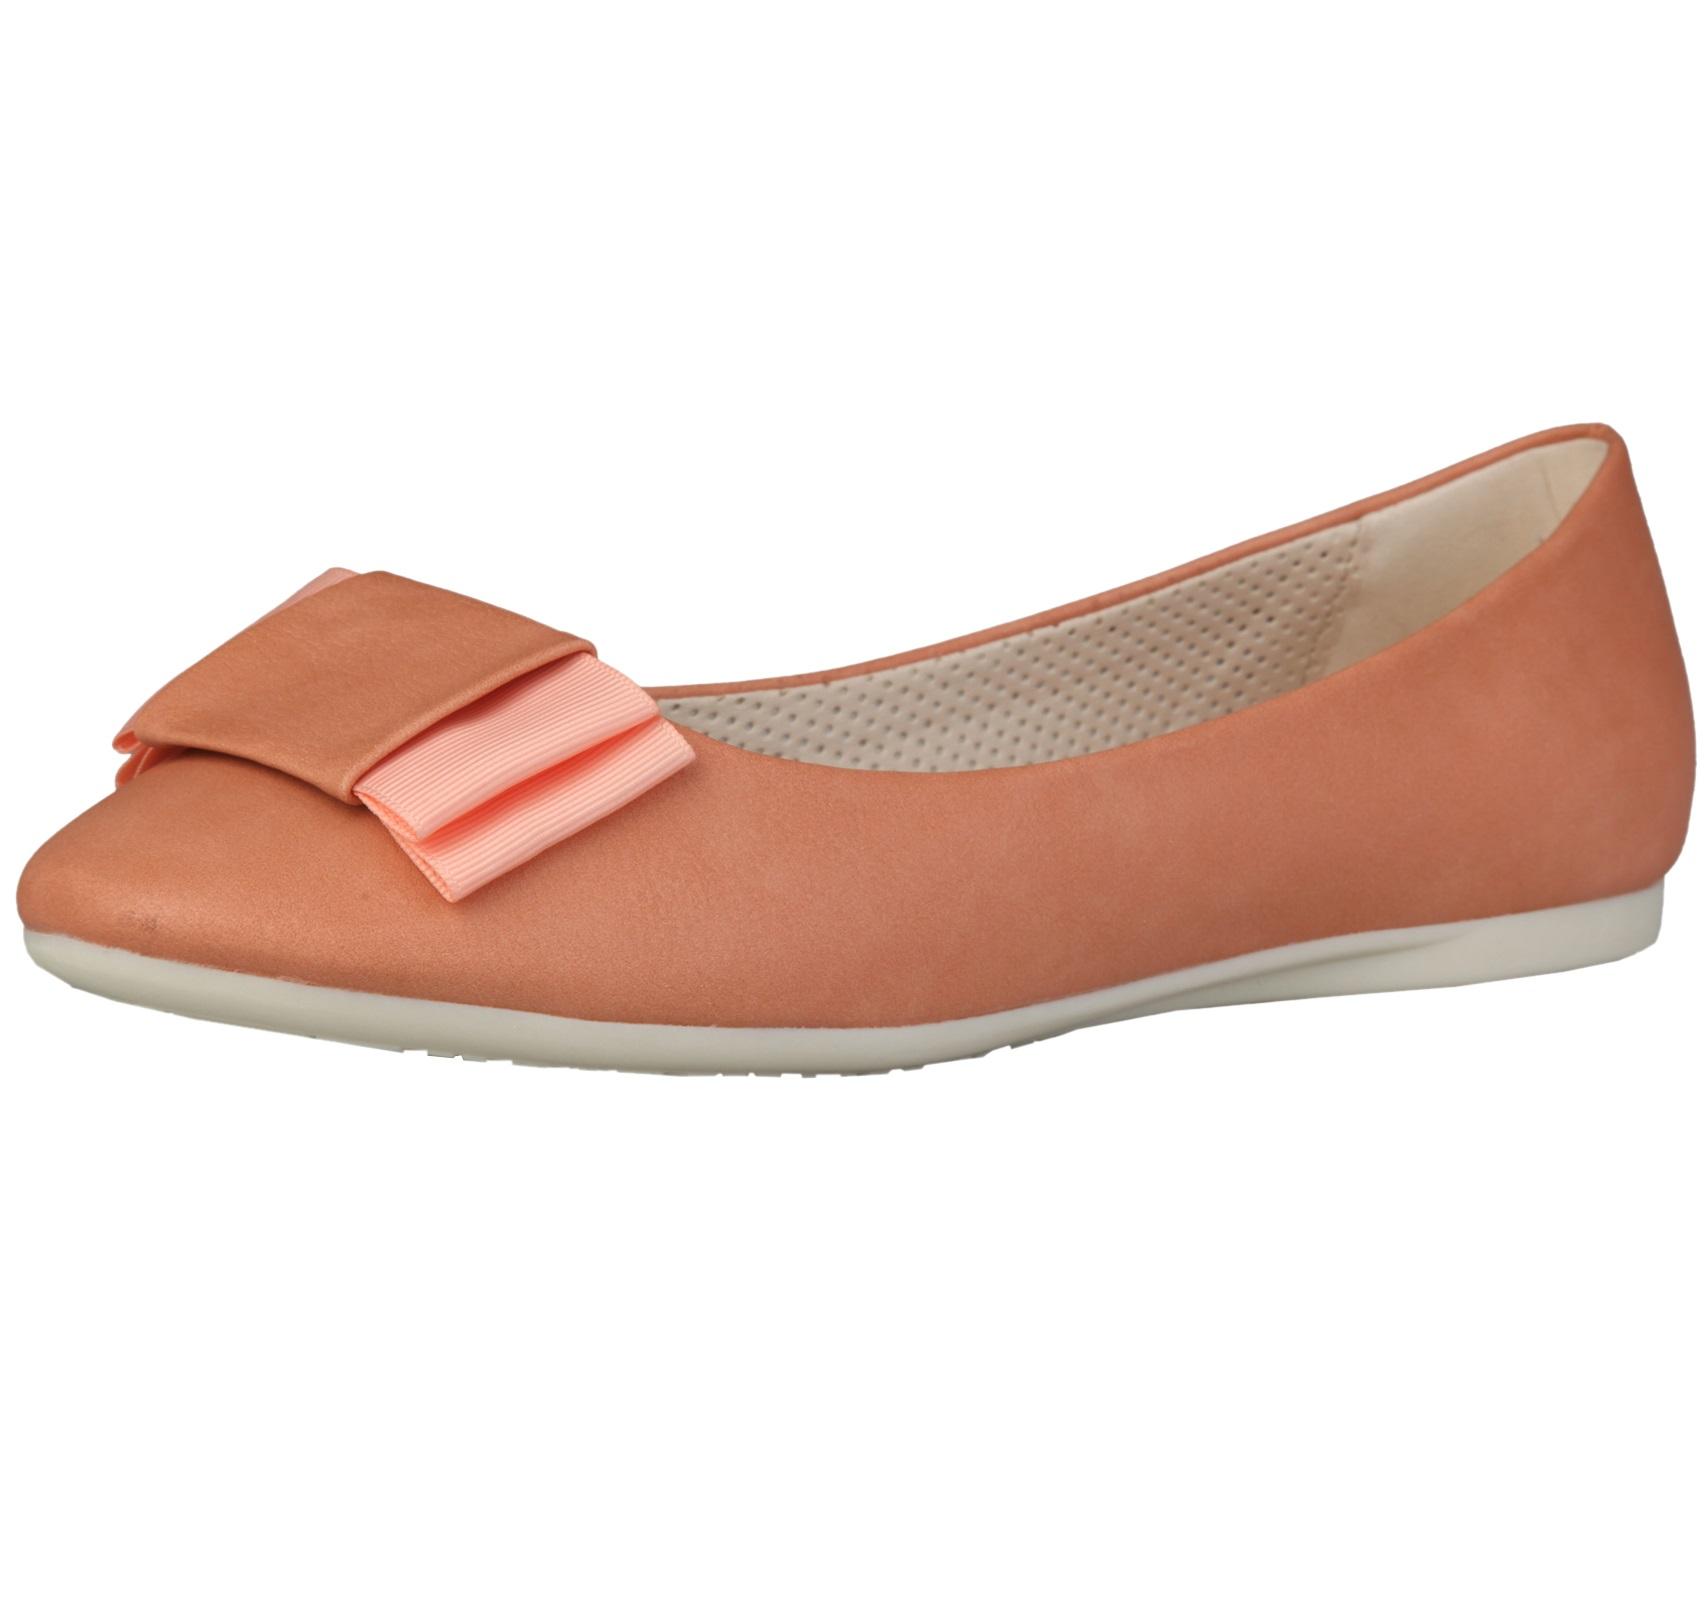 Sofia Loes Flat Shoes Fiocco Albicocca Rf600155